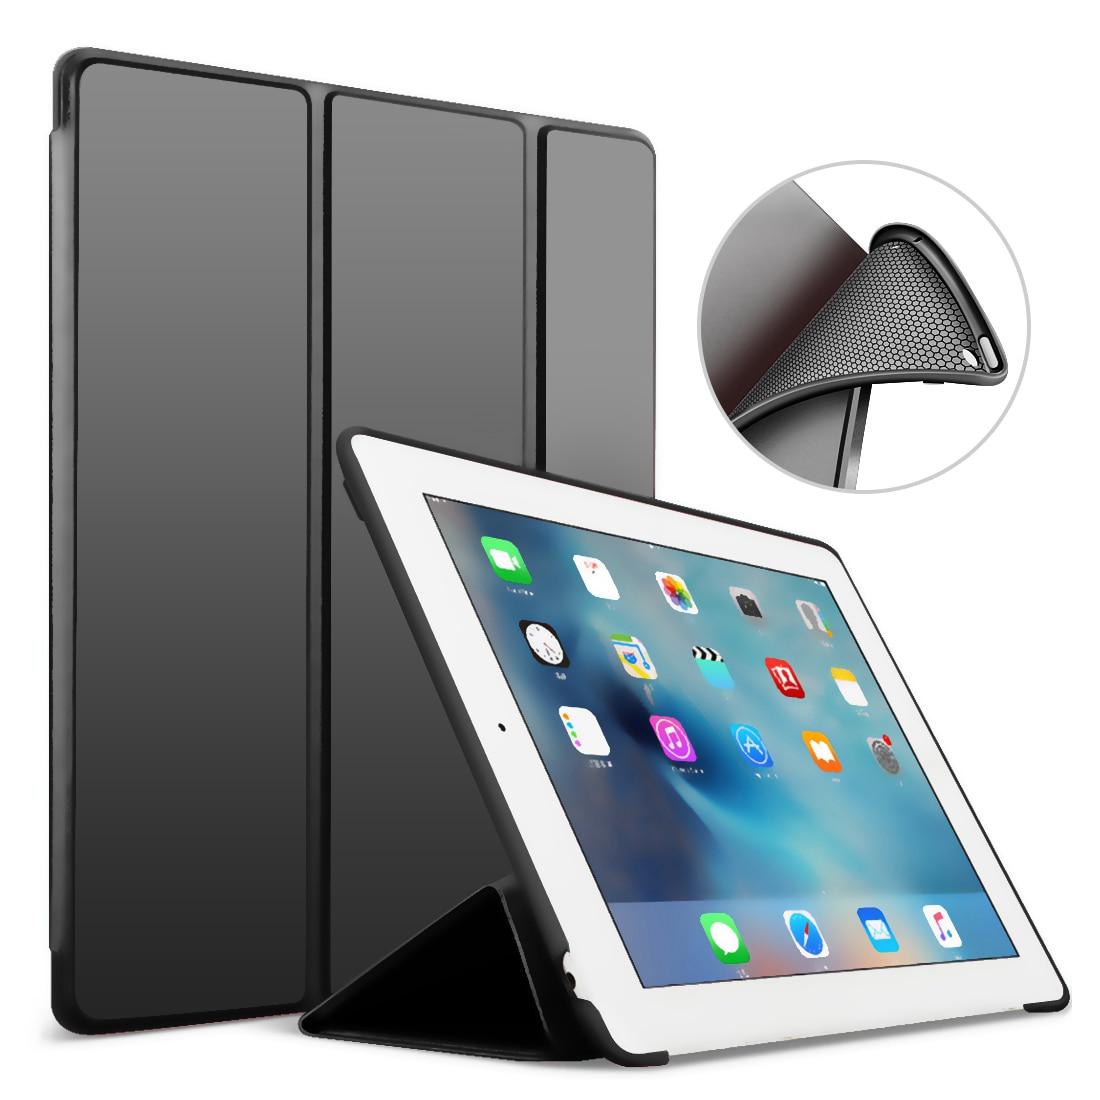 Hoesje voor iPad Mini 4 3 2 1 Case PU-leder Silicon Soft Back Trifold - Tablet accessoires - Foto 2